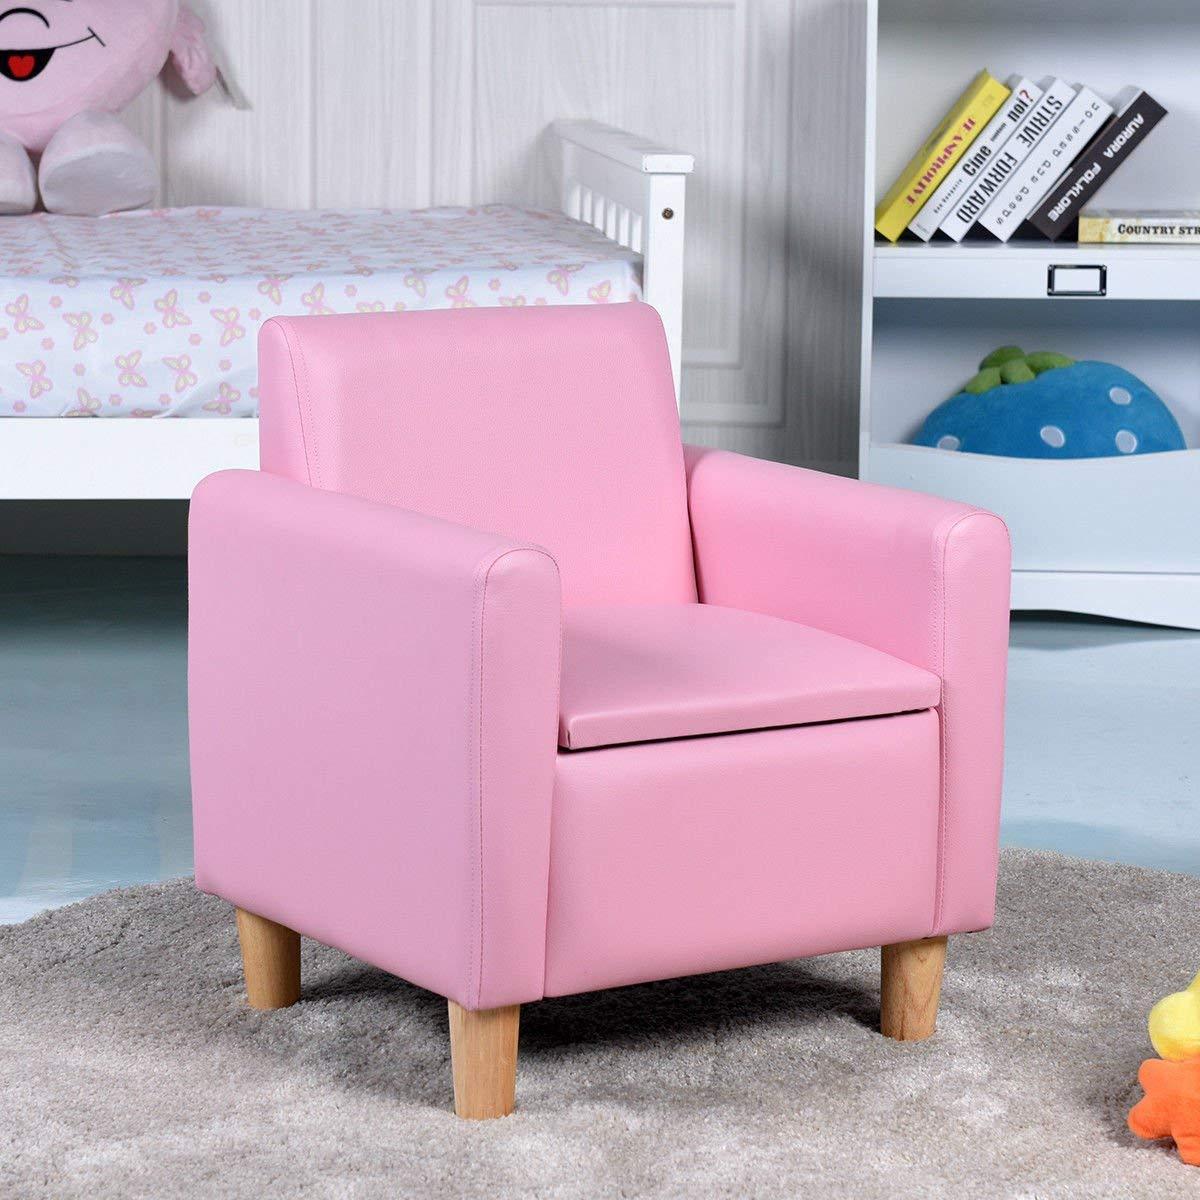 HONEY JOY Kids Sofa, Upholstered Armrest, Sturdy Wood Construction, Toddler Couch with Storage Box (Single Seat, Pink) by HONEY JOY (Image #3)